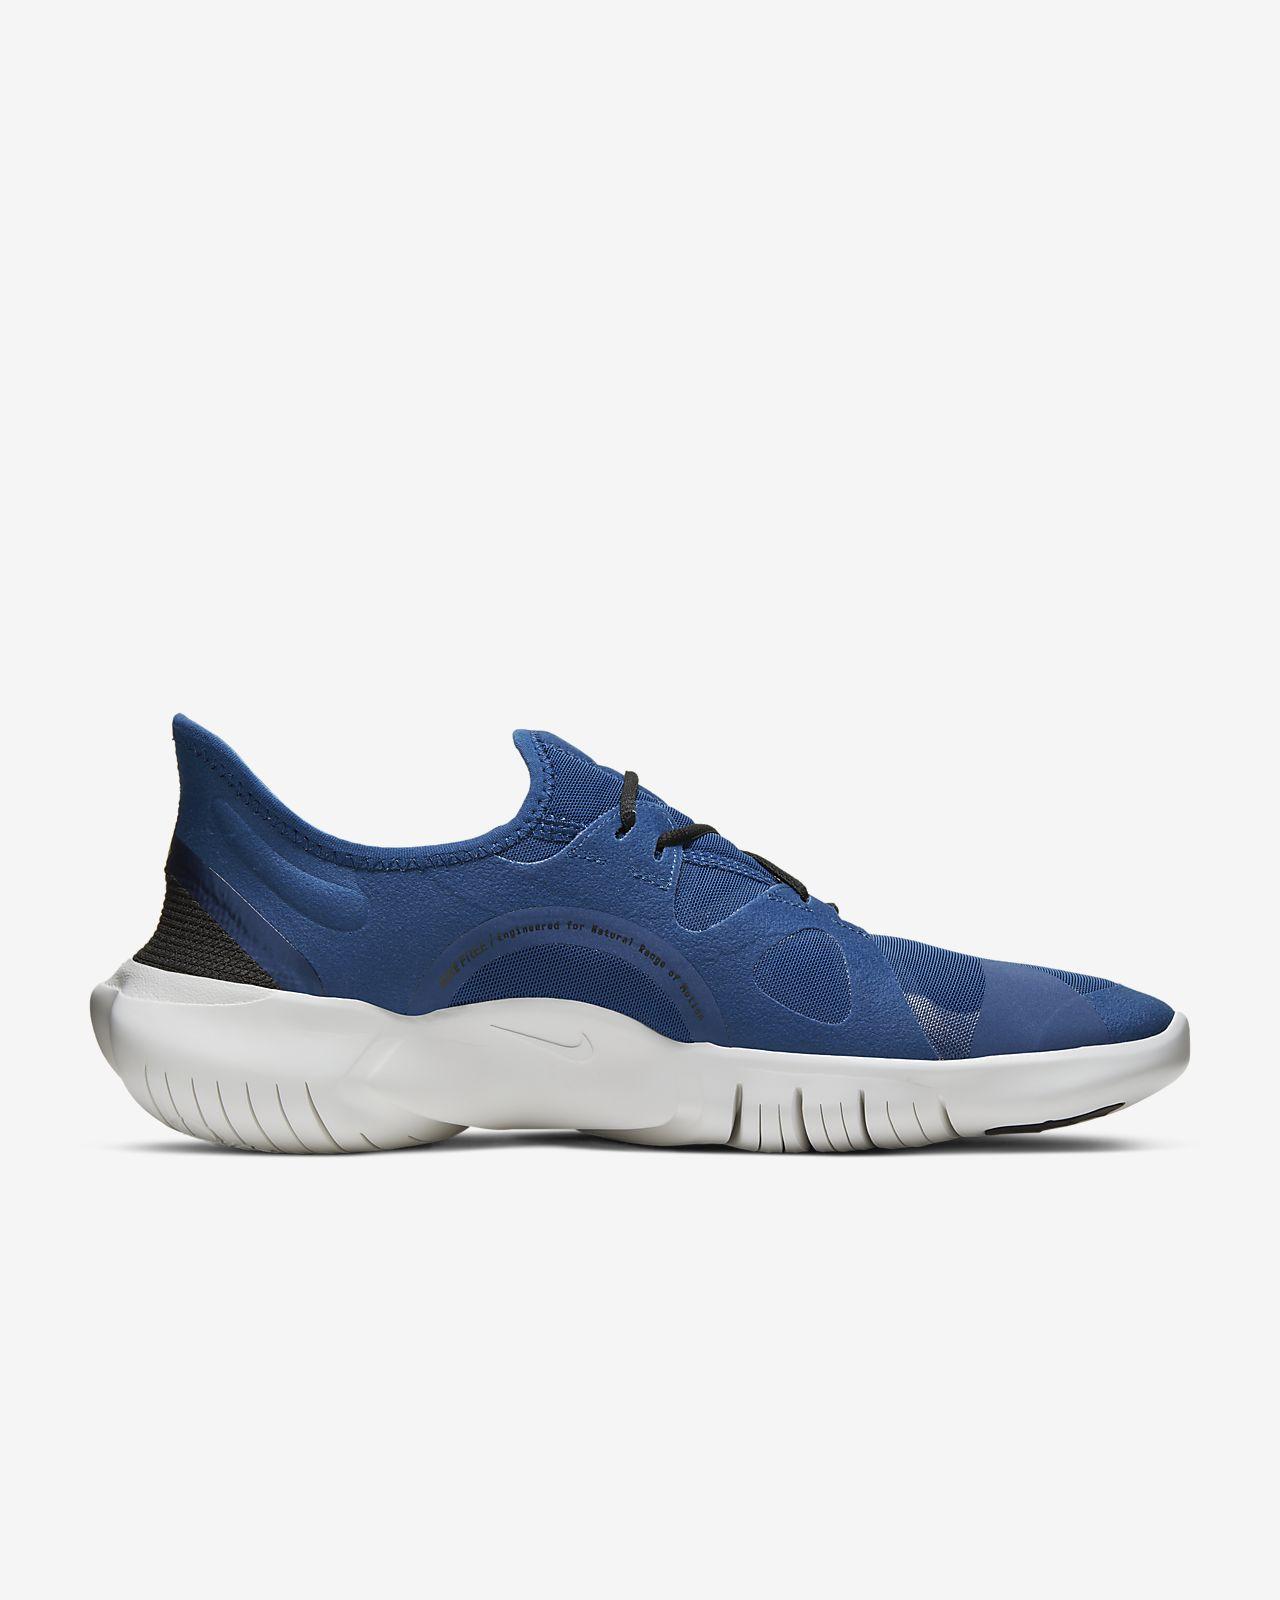 zapatillas nike free 5.0 mujeres para correr azul marino